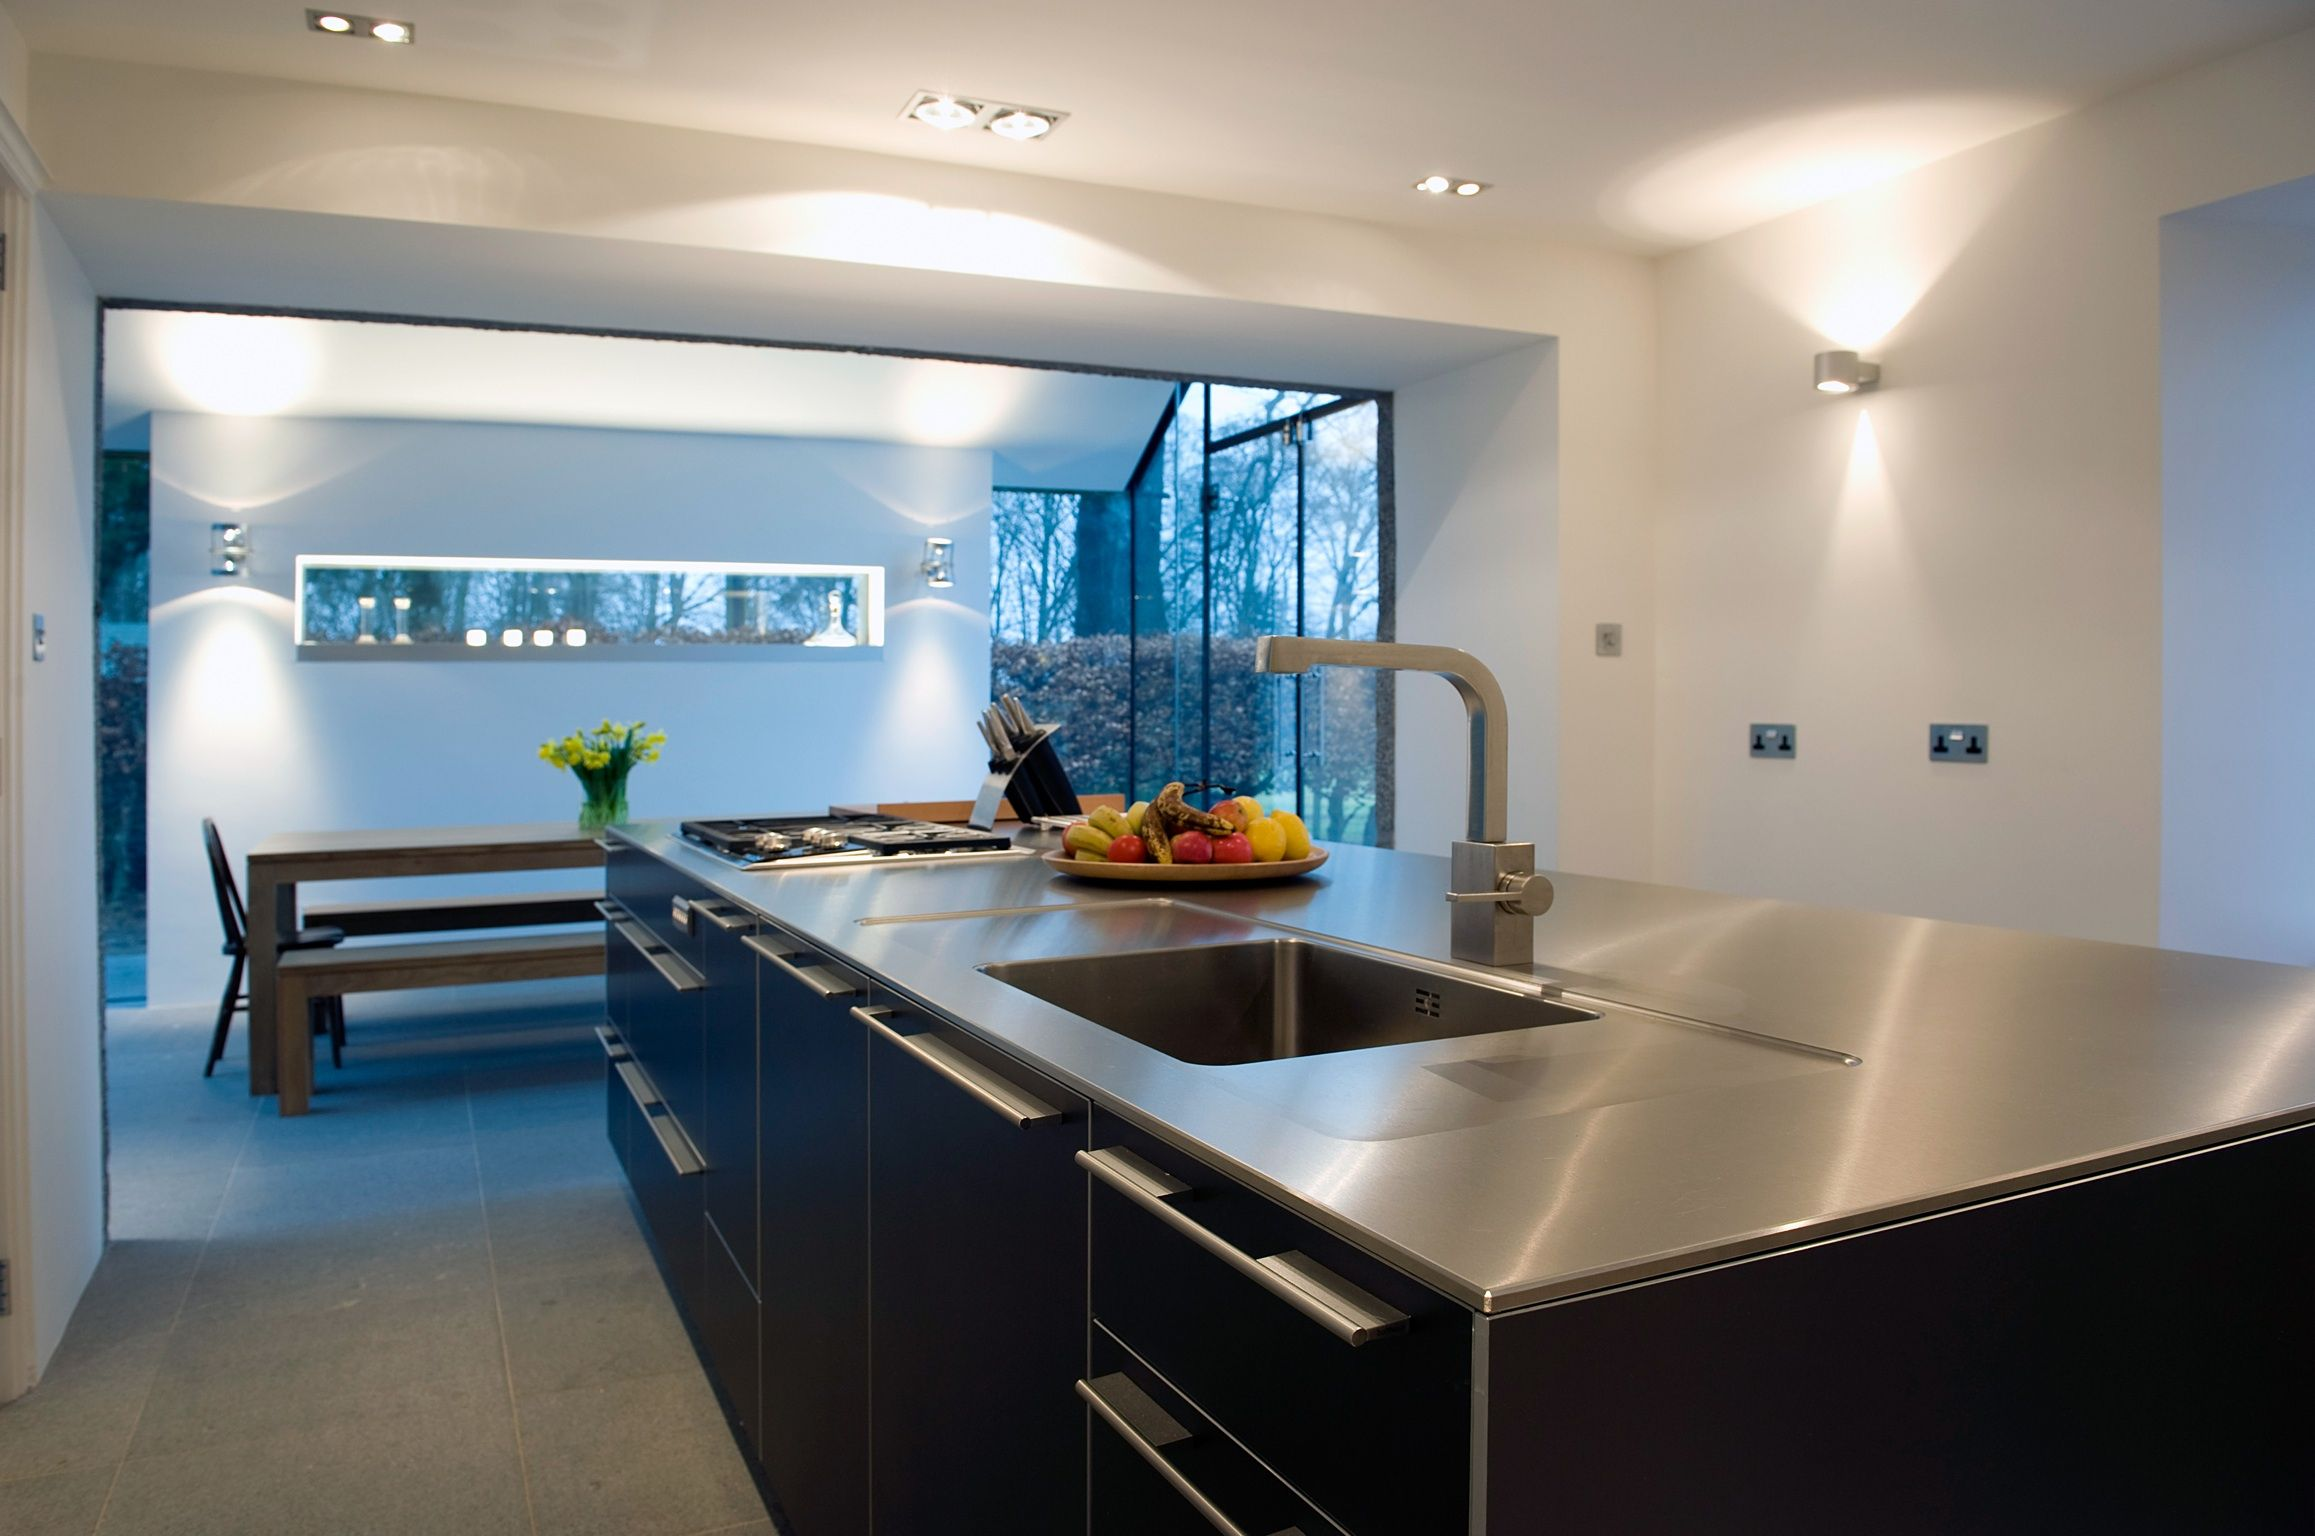 Bulthaup Kitchen Island Part - 20: Prospect House Kitchen With Bulthaup Island Unit. Www.jamstudio.uk.com